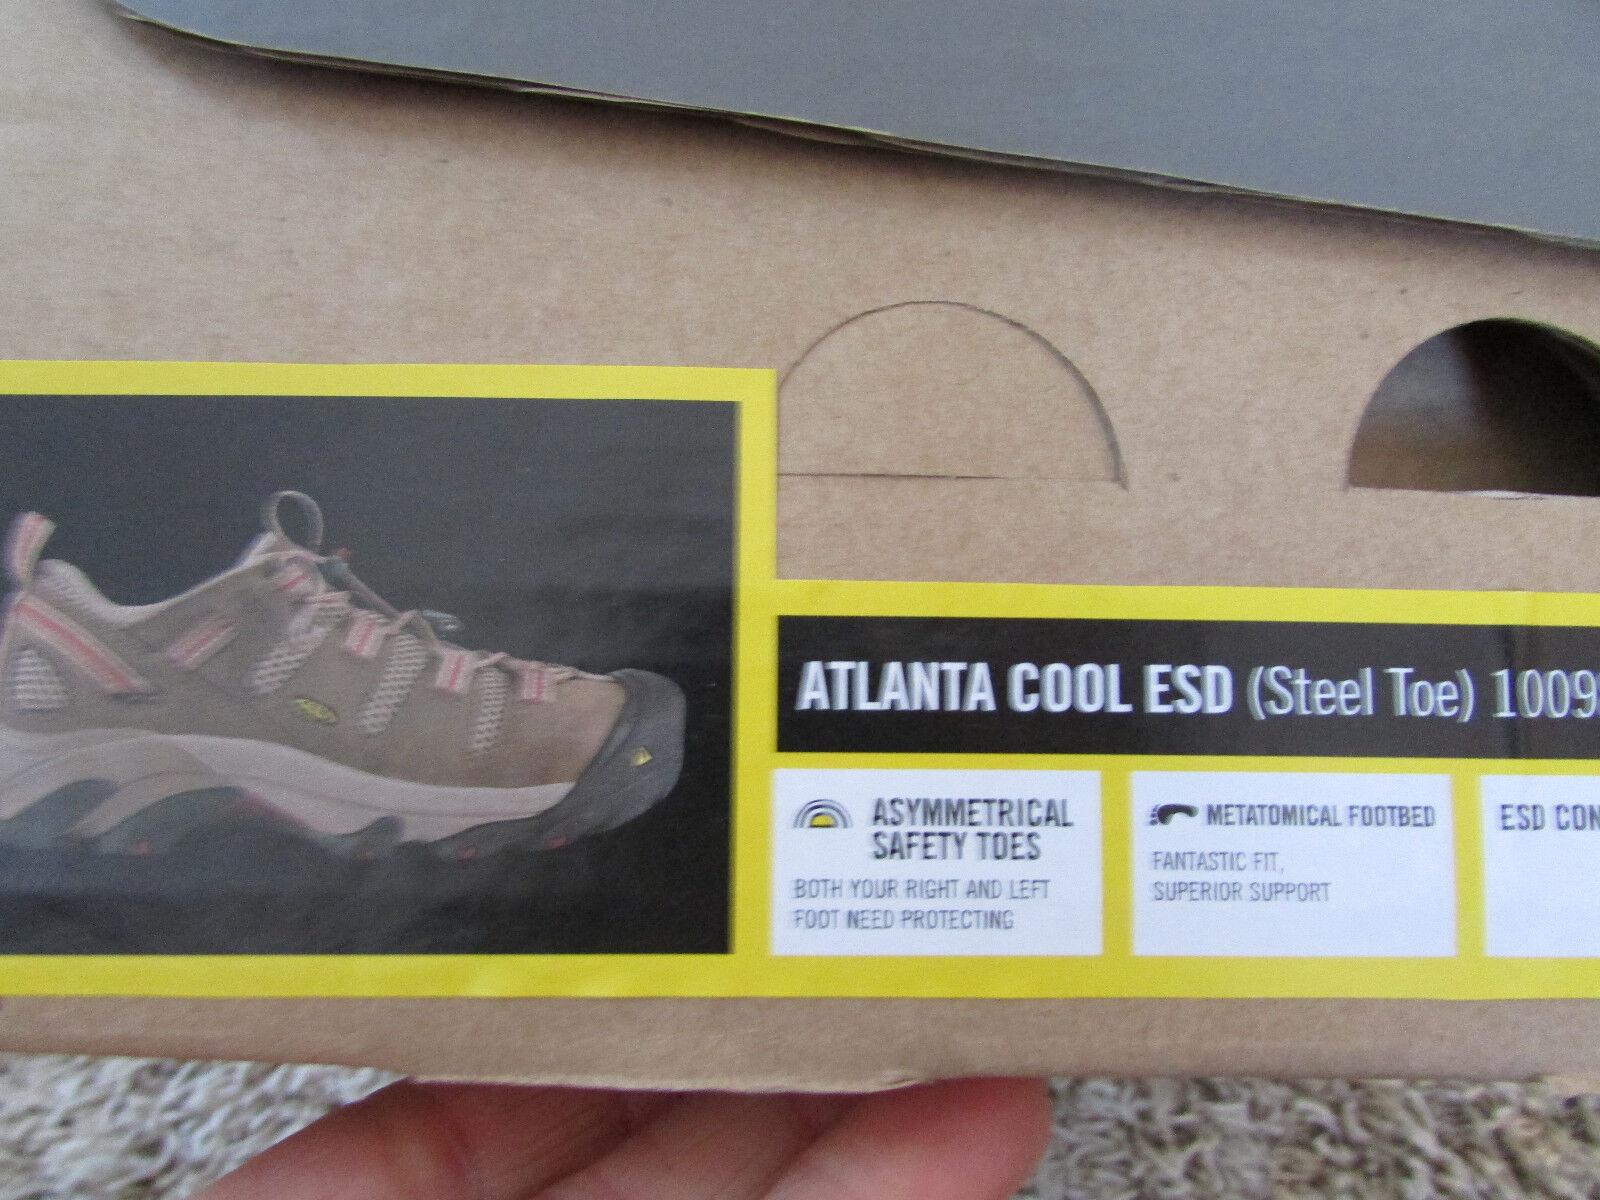 NEW KEEN ATLANTA STEEL TOE WORK Schuhe Damenschuhe KEEN 6 1009875M SAFETY TOE KEEN Damenschuhe UTILITY 8e4704